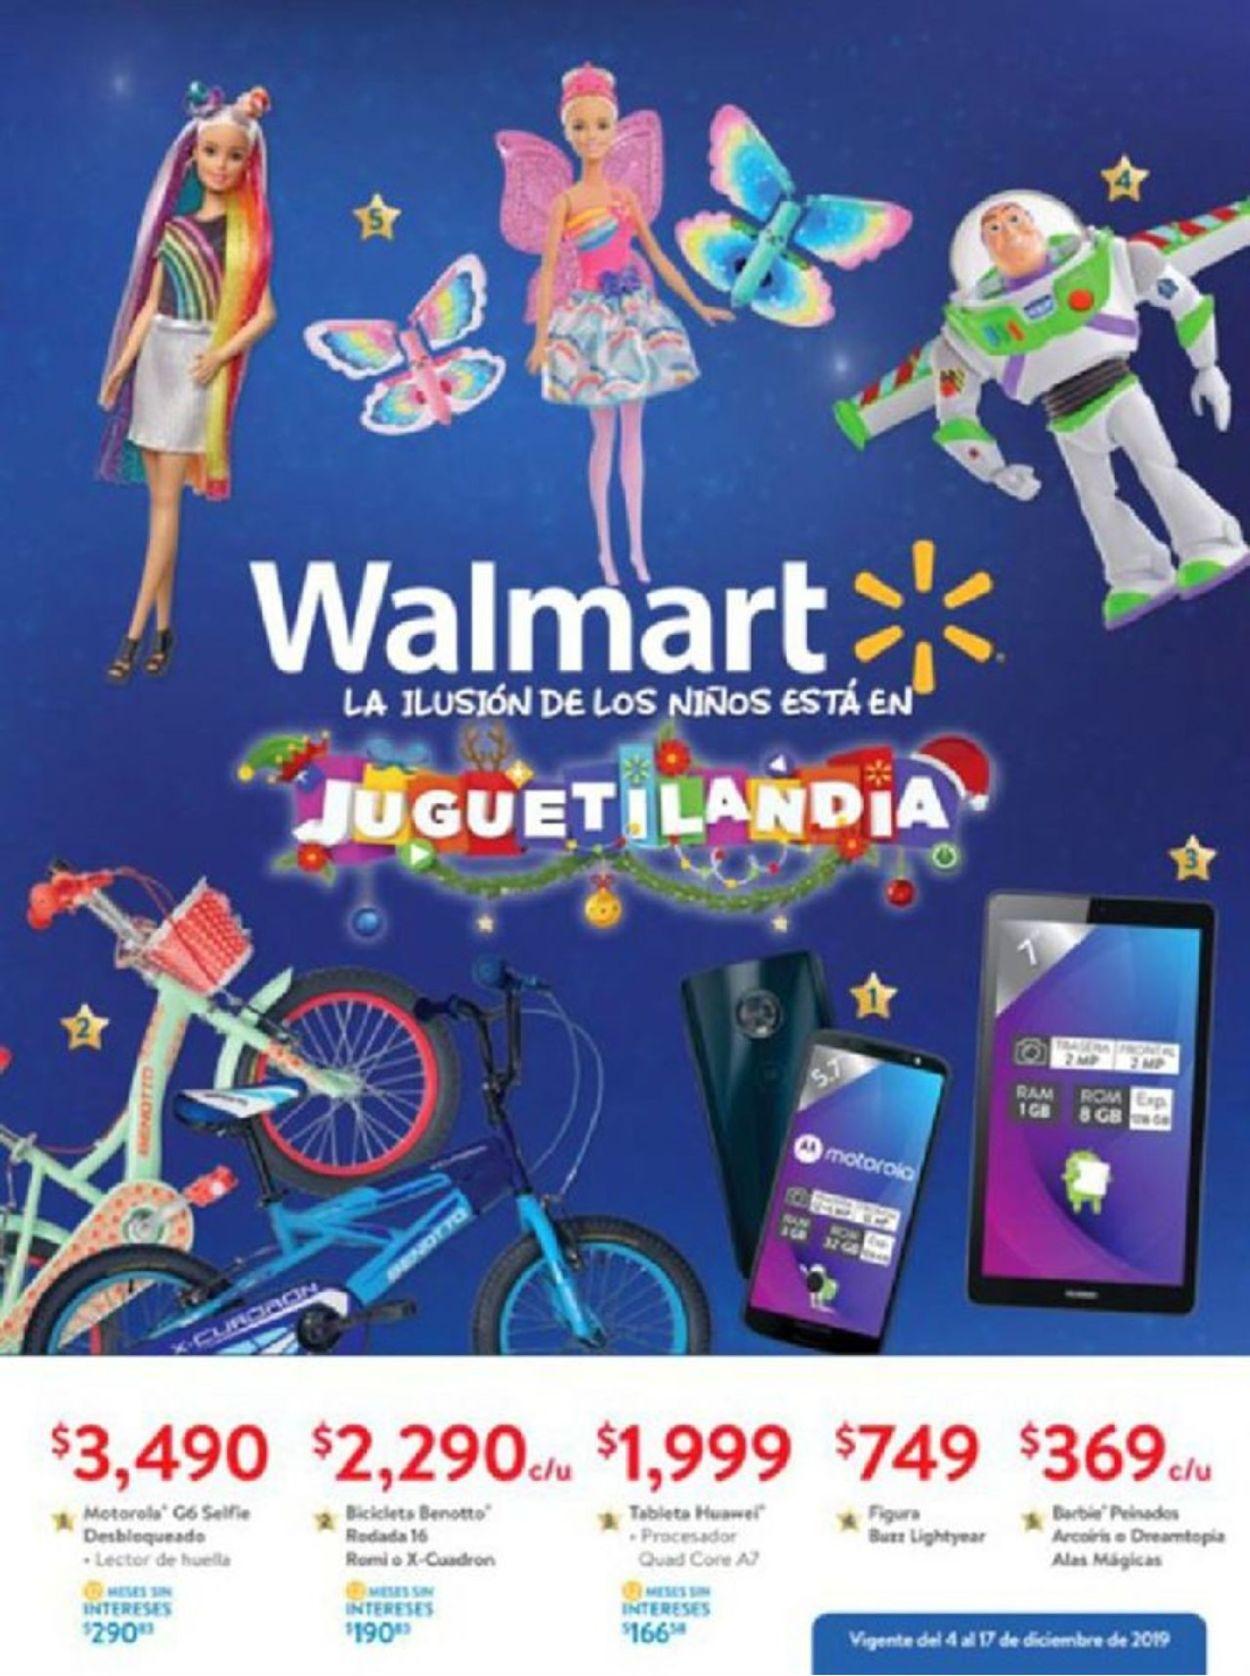 Walmart Catálogo Navideño Folleto - 04.12-17.12.2019